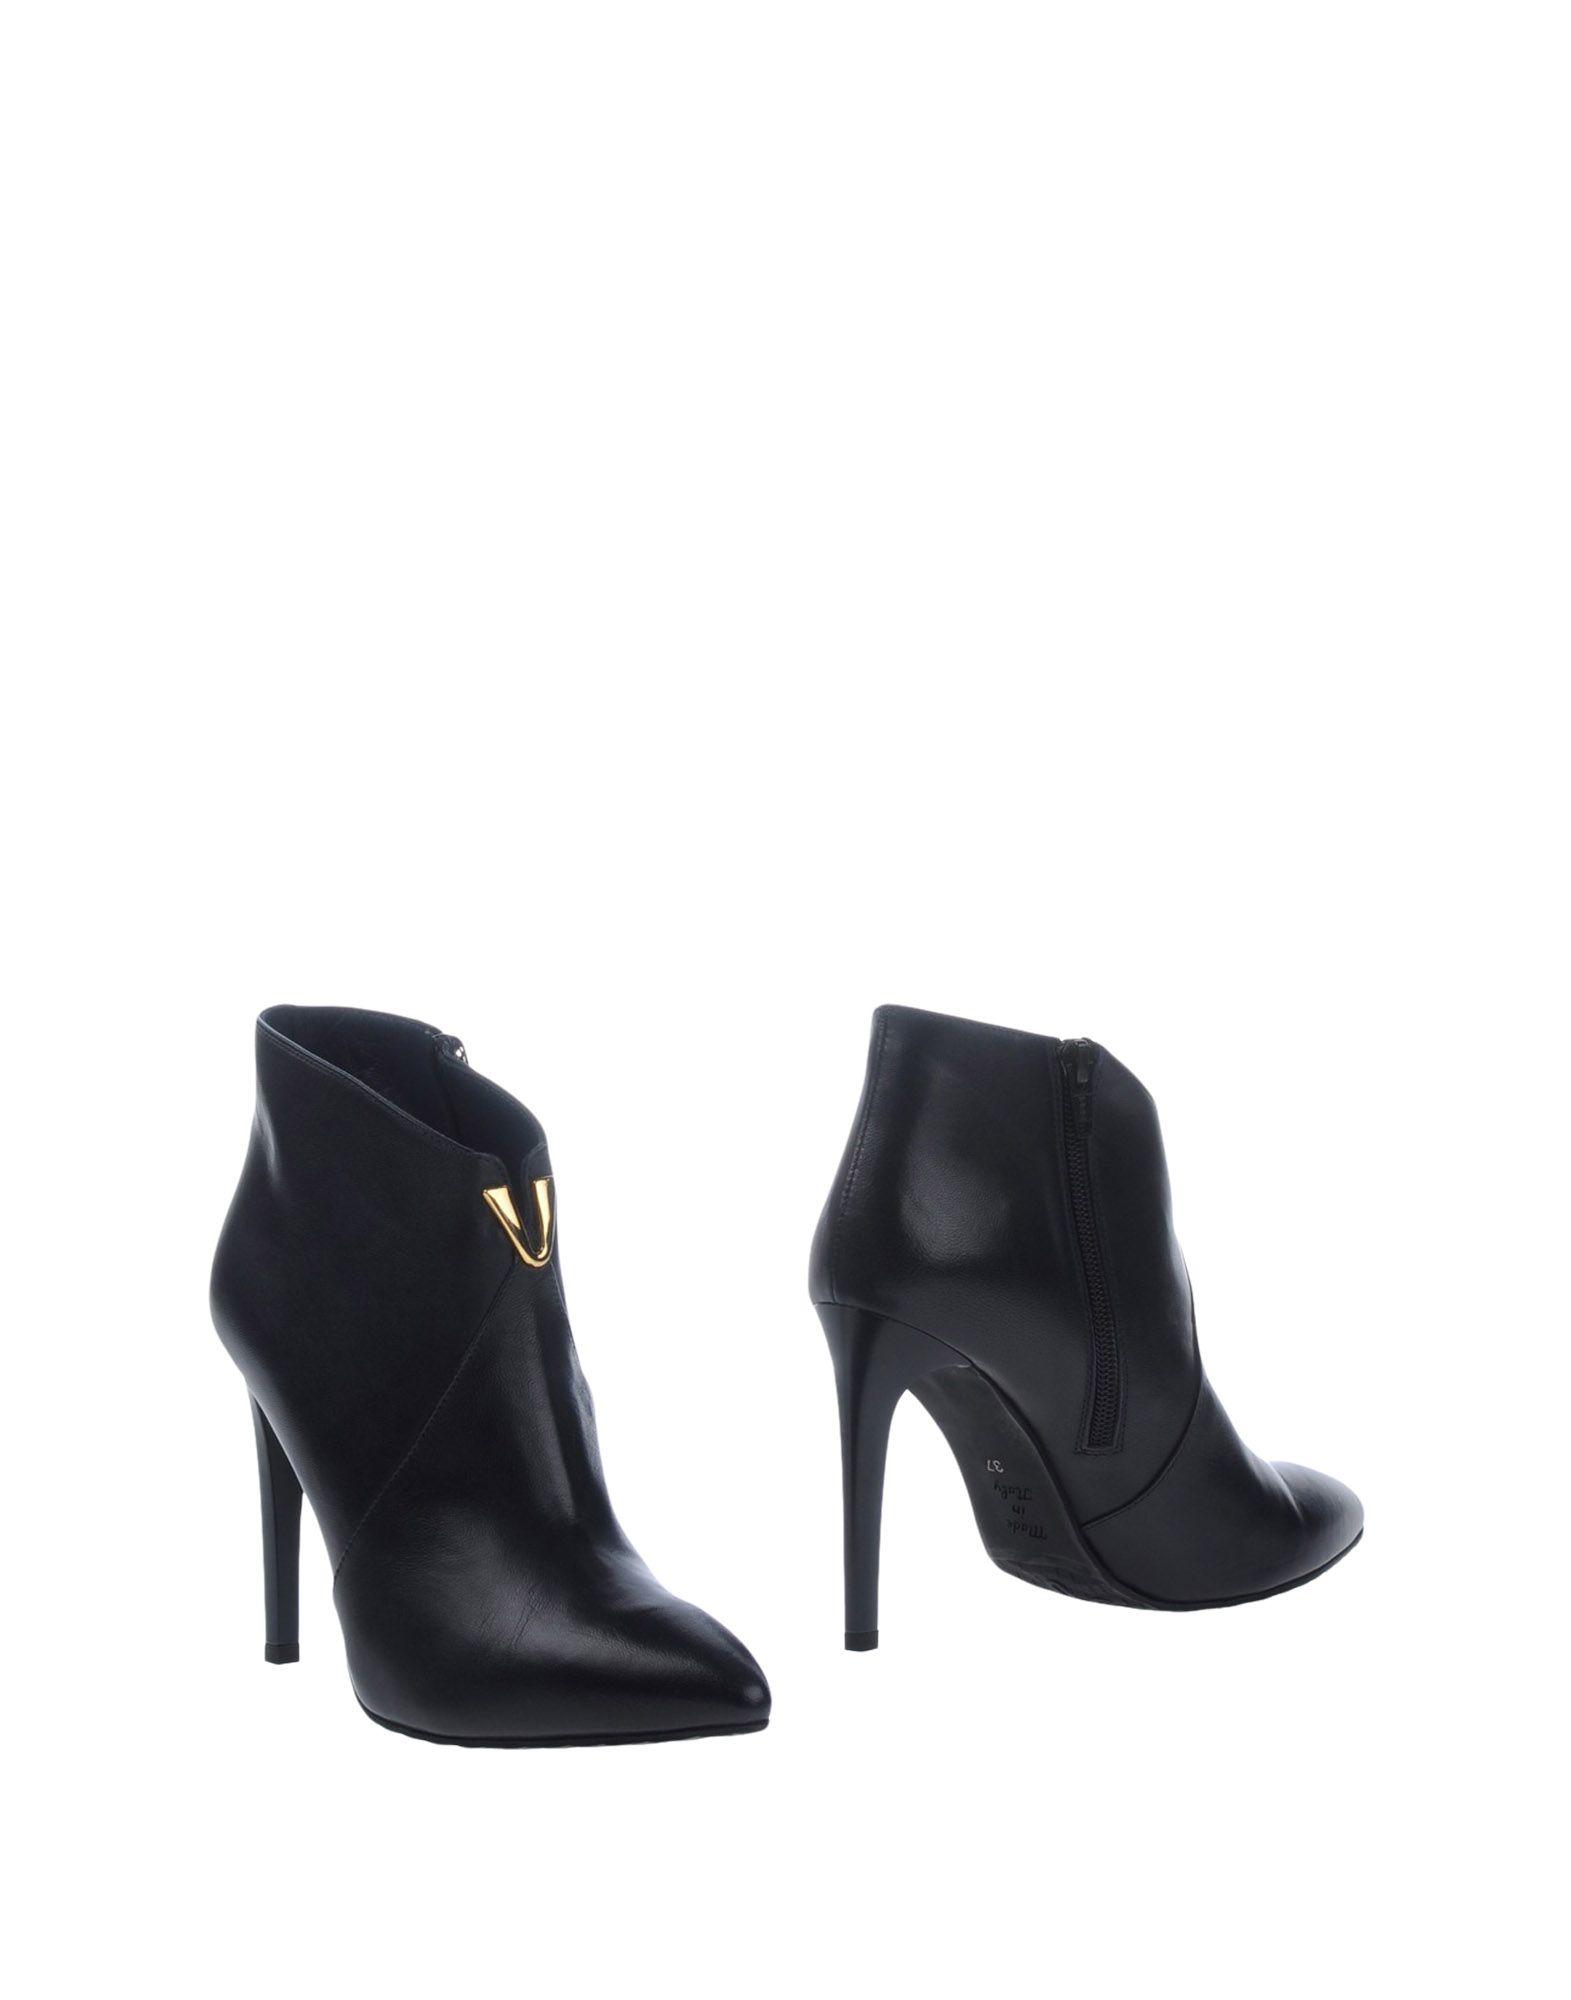 Stilvolle billige Stiefelette Schuhe Sgn Giancarlo Paoli Stiefelette billige Damen  11043711GP 9ced43